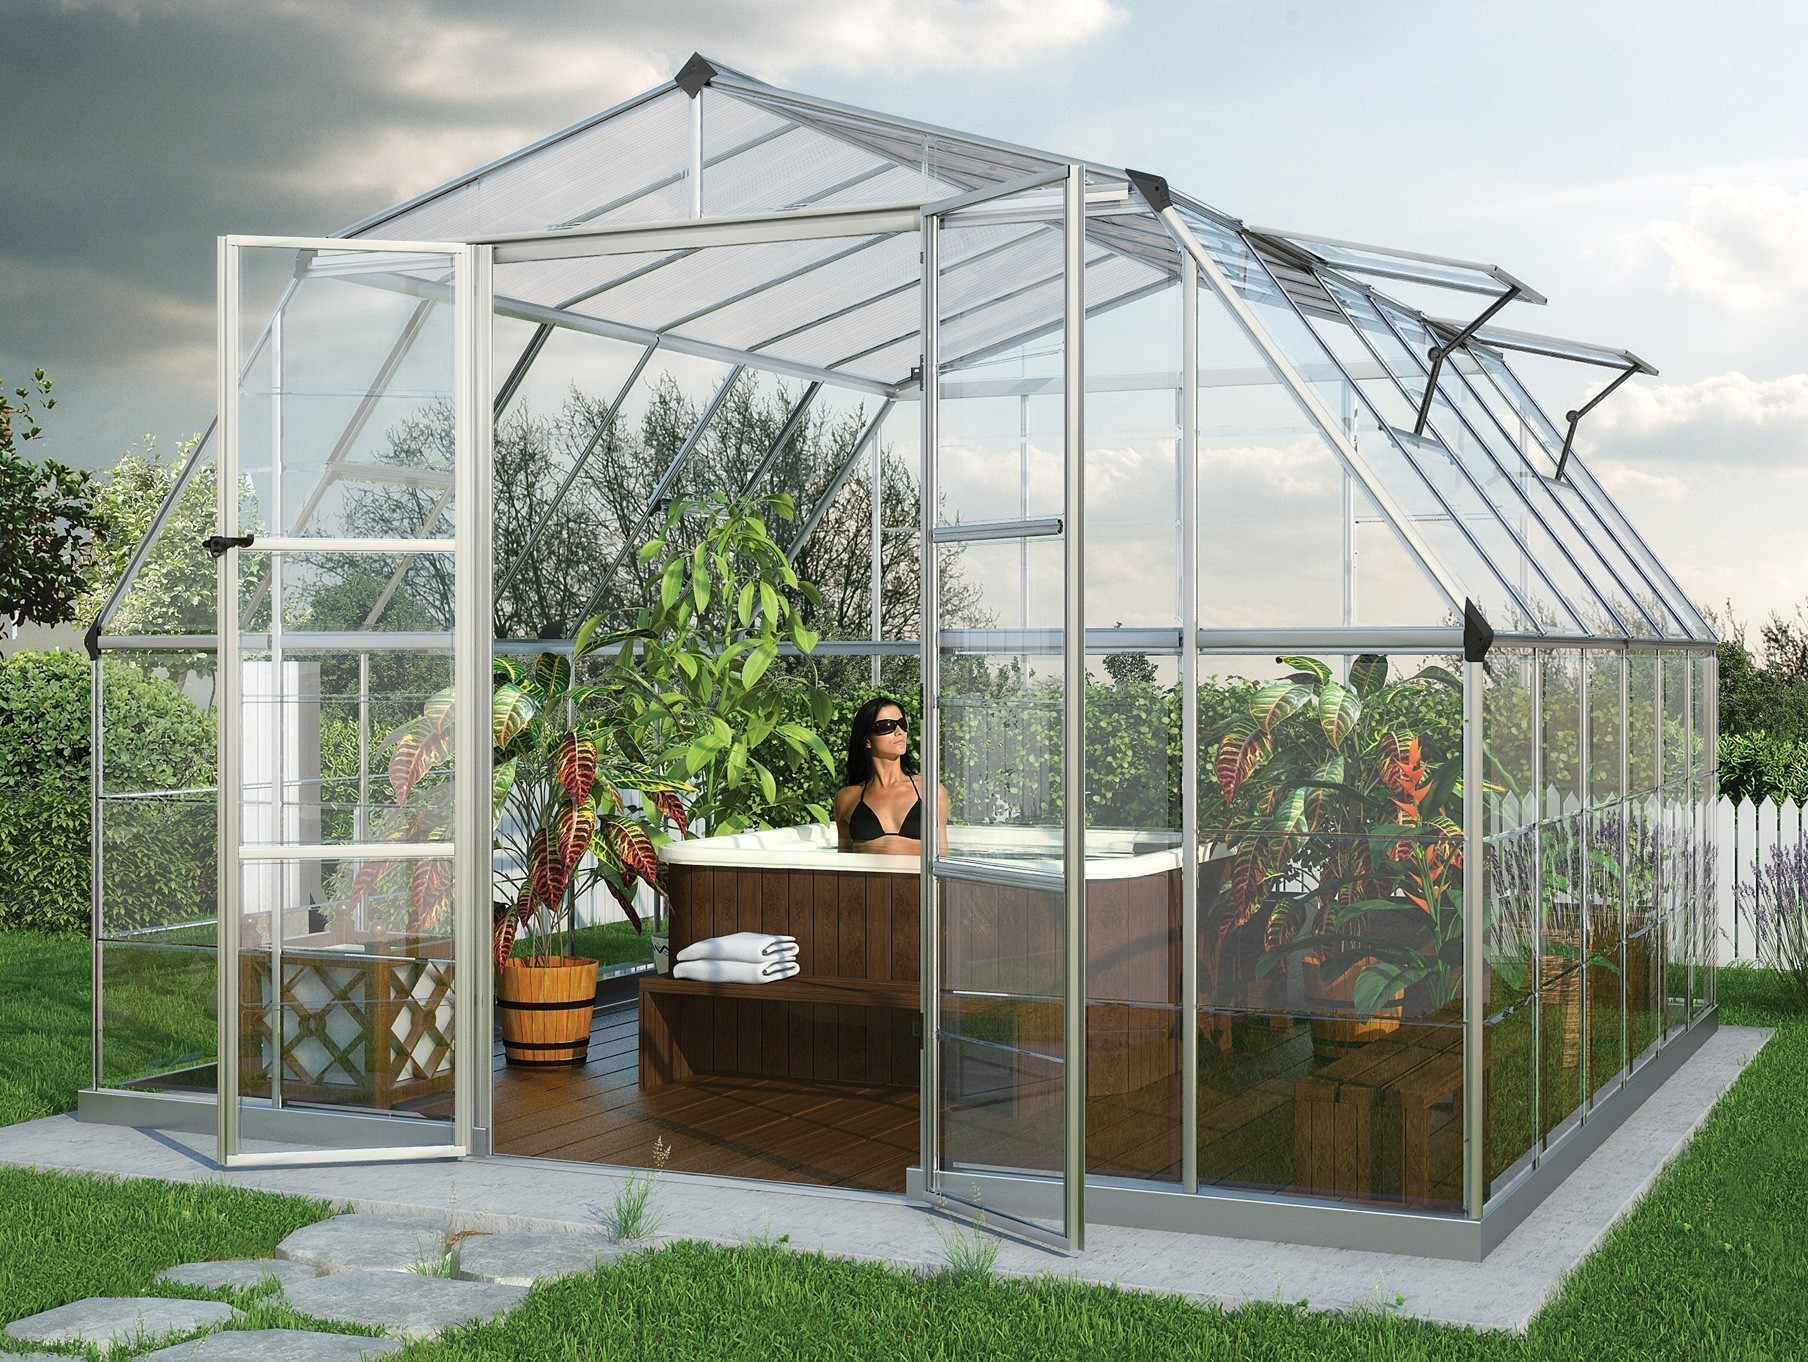 gew chshaus treibhaus tepro americana 12x12 alu 4 mm. Black Bedroom Furniture Sets. Home Design Ideas